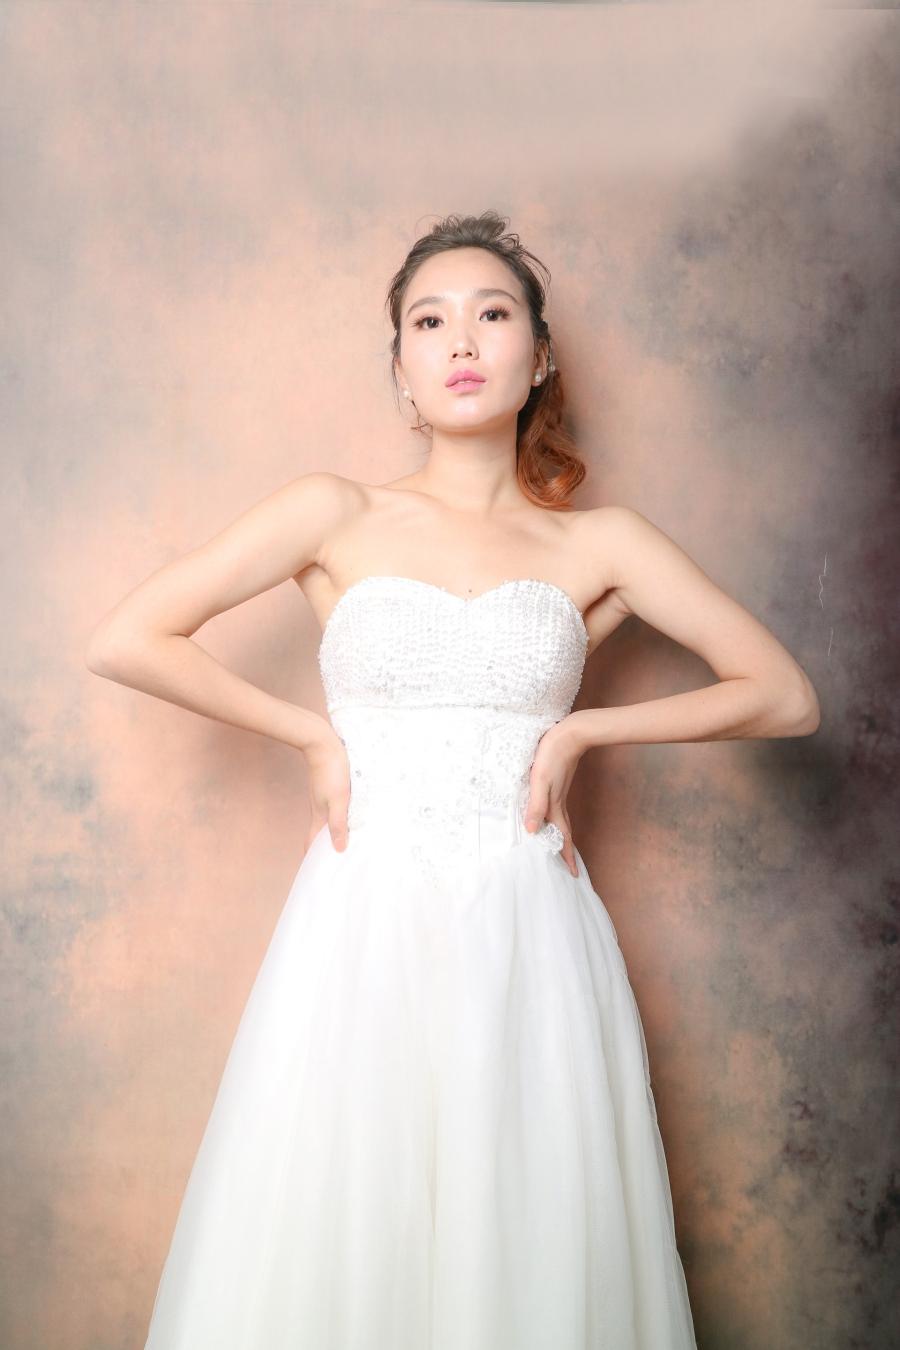 coolstylist韓式新娘化妝髮型攝影服務_bridal_wedding_Korea_makeup_hairstyling_Top_MUA_paulstylist_photography_hk_model_Liya-8b